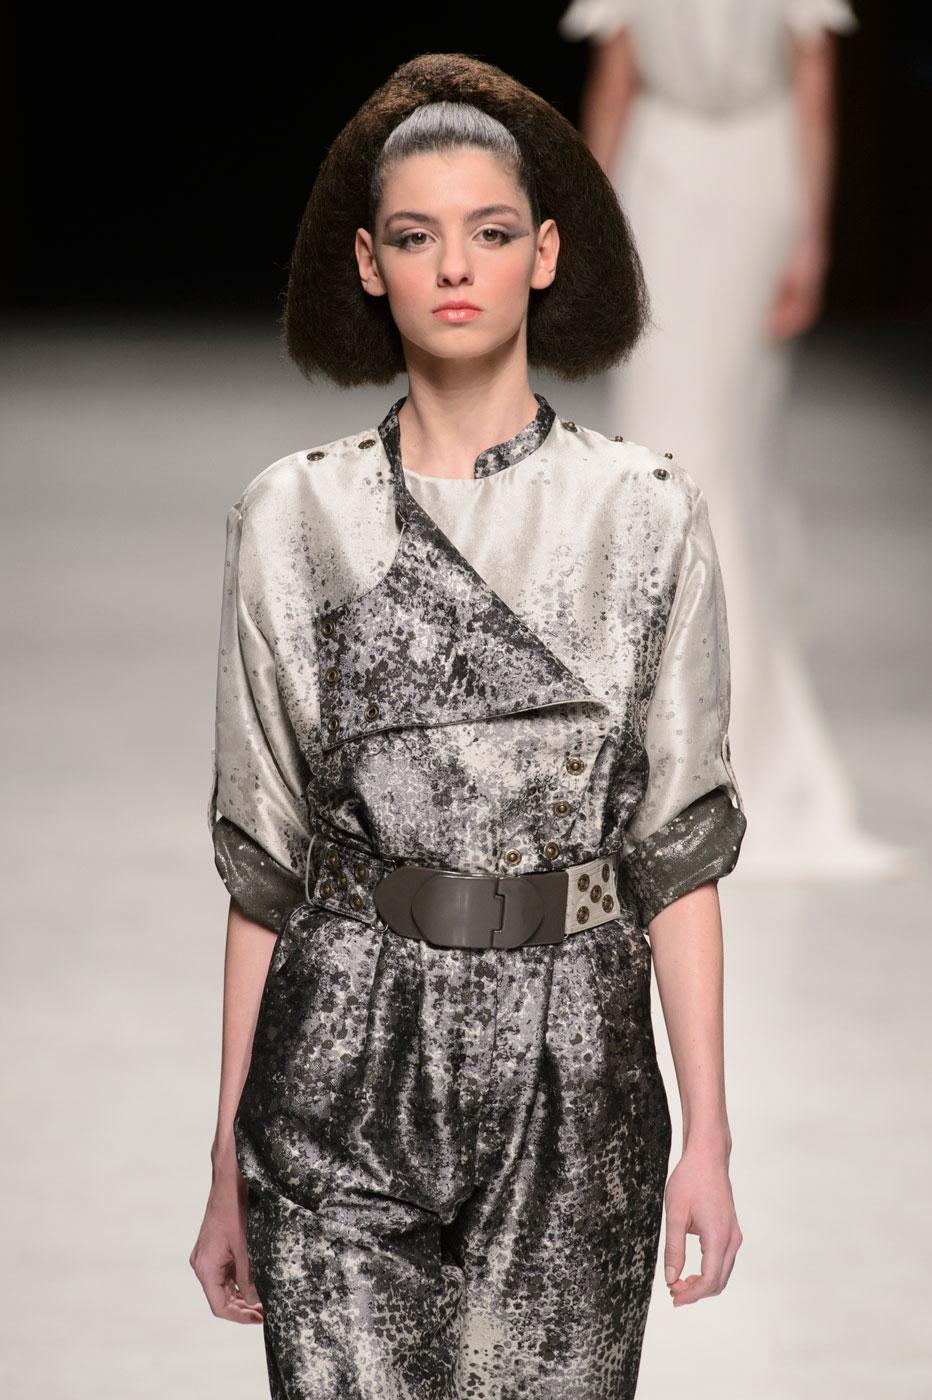 Julien-Fournie-Prive-fashion-runway-show-haute-couture-paris-spring-2015-the-impression-31